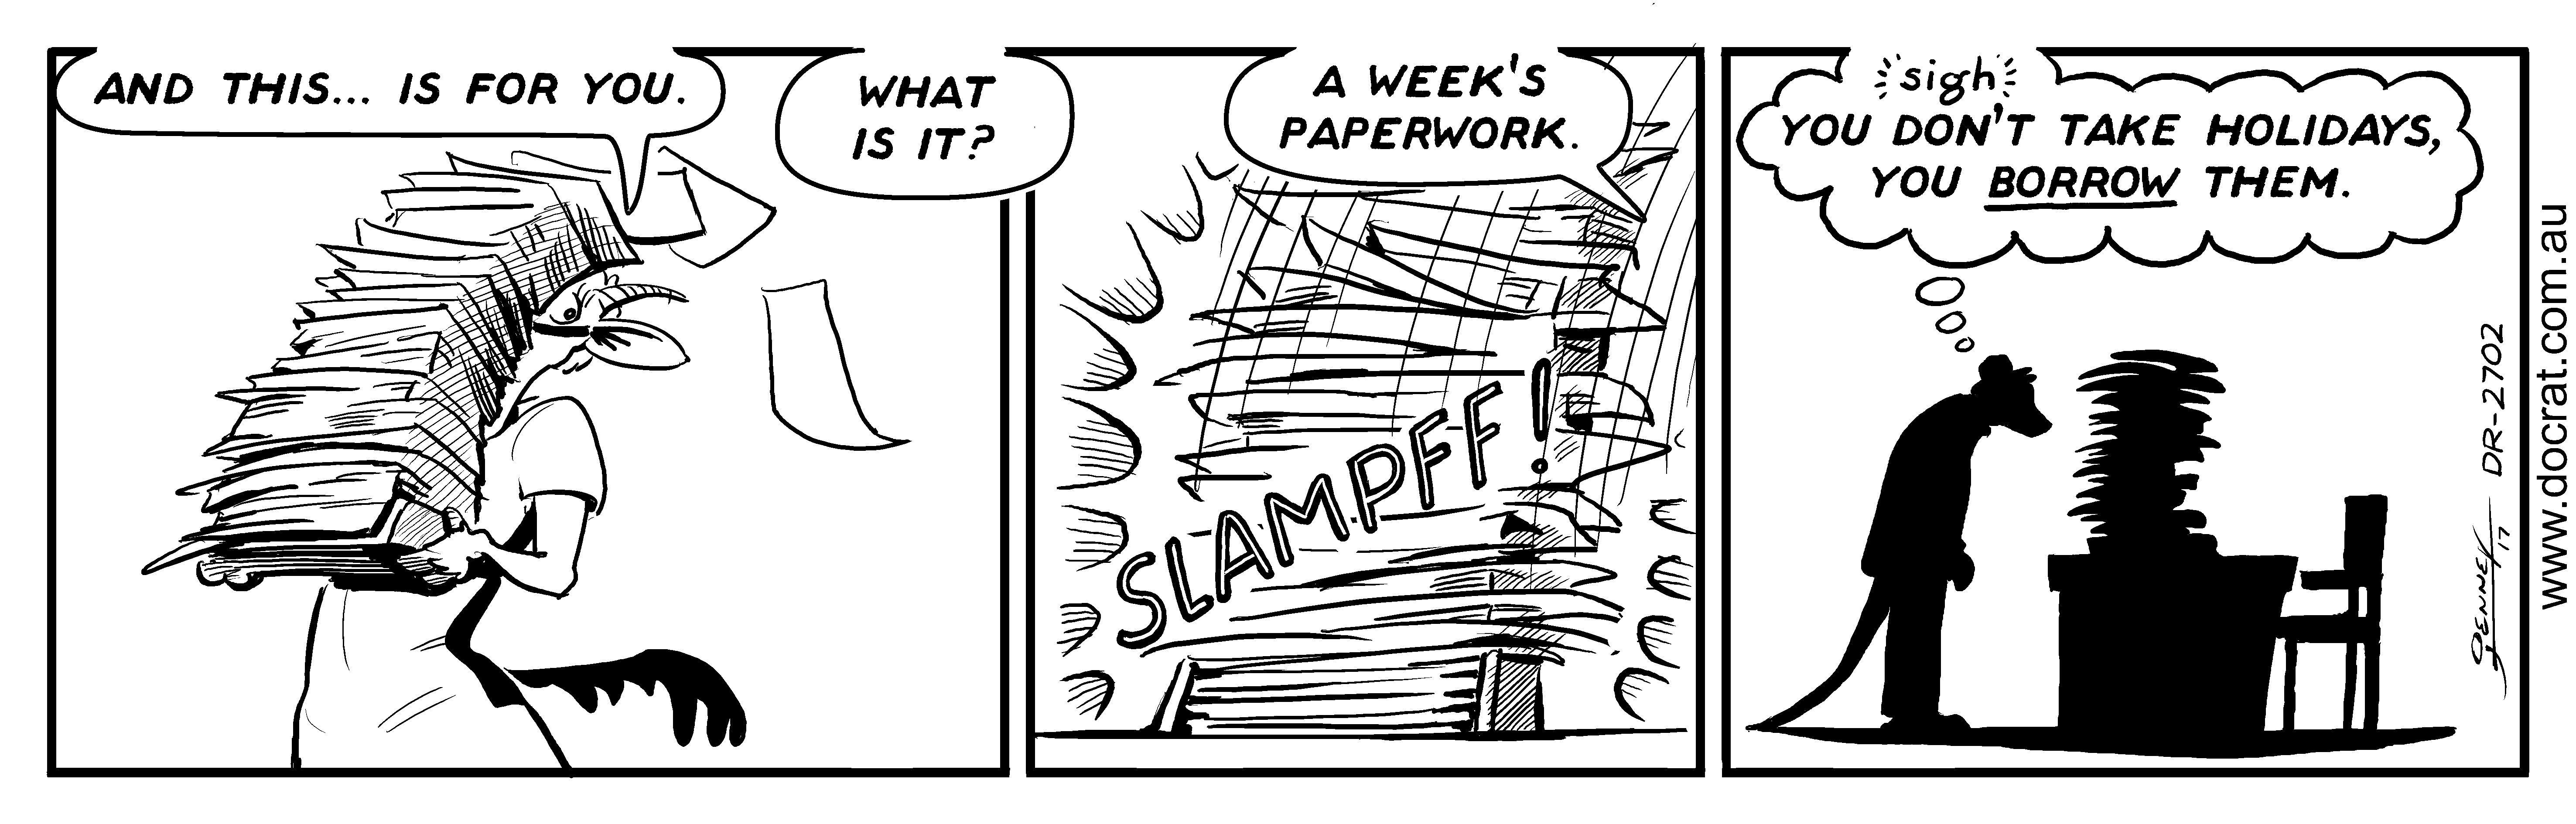 20170131